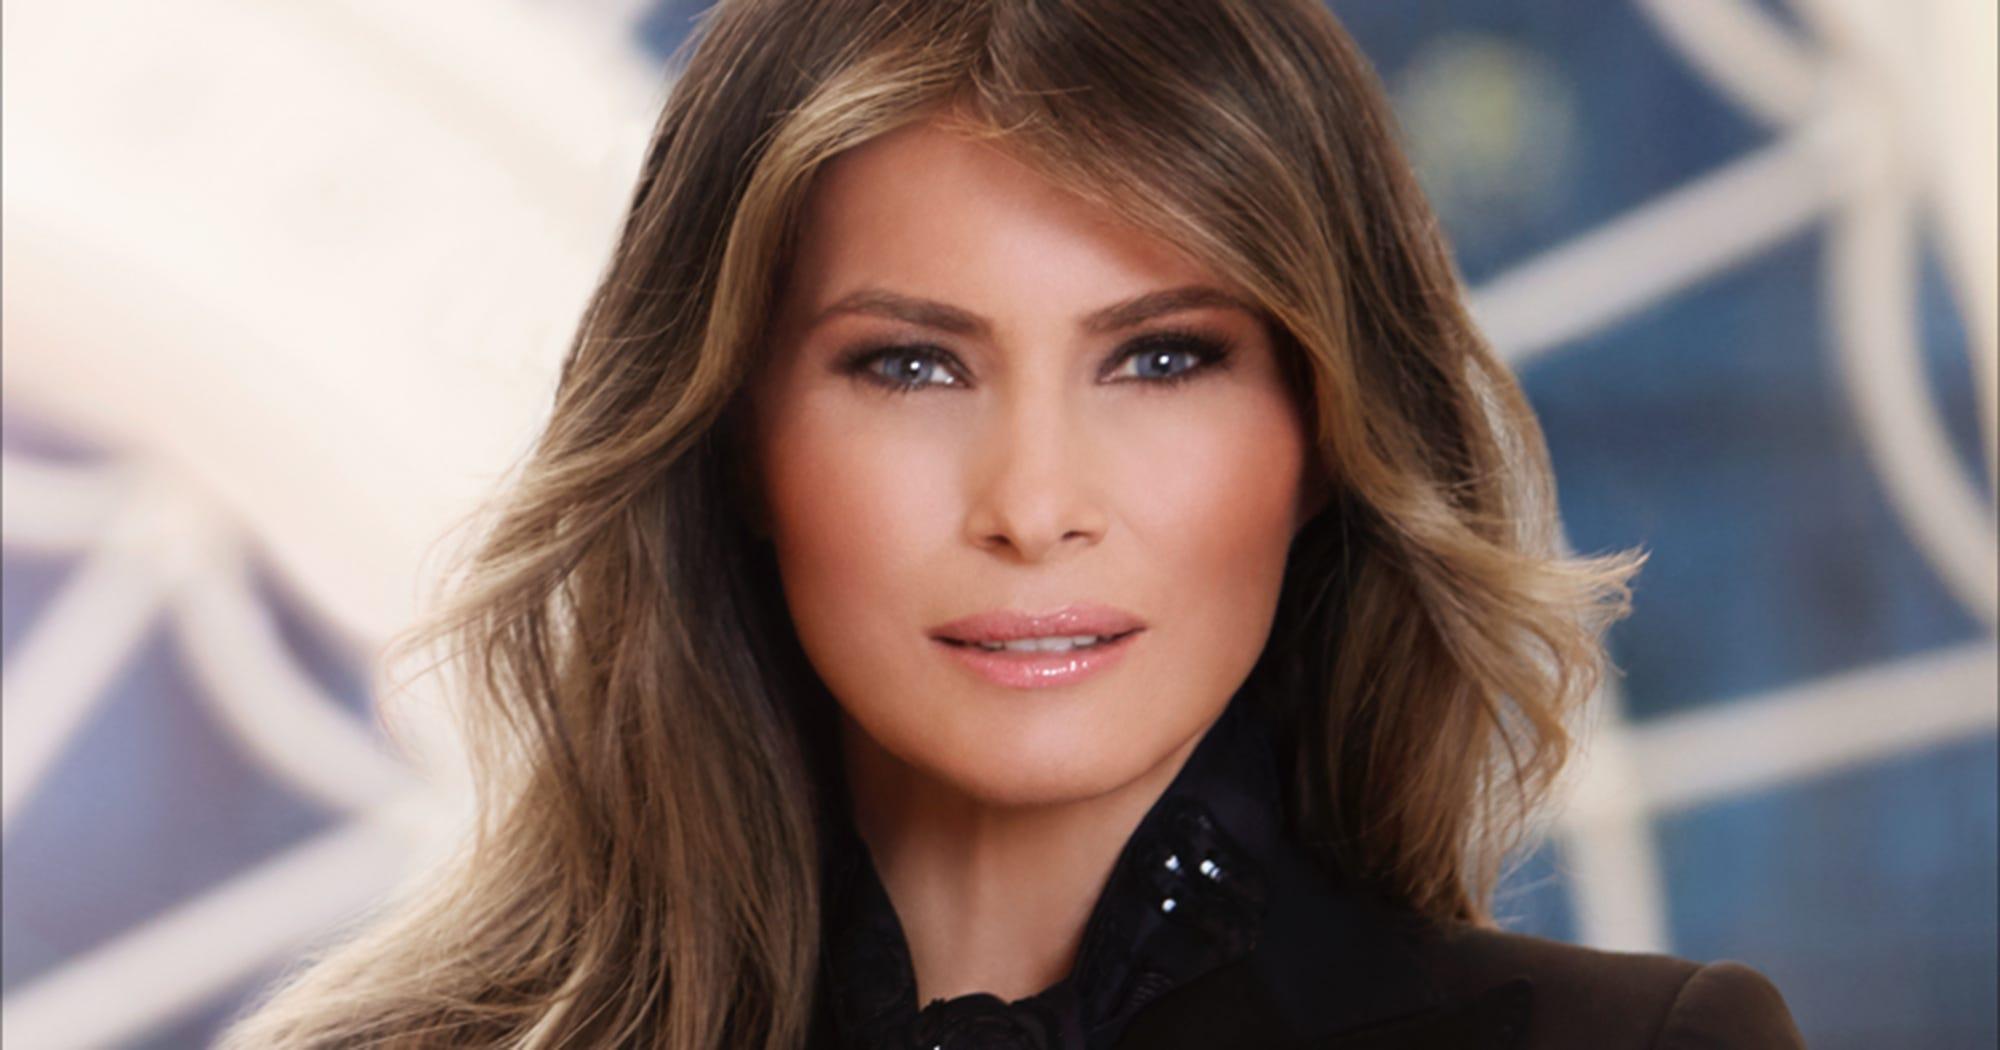 Melania Trump Diamond Ring Portrait Twitter Reactions